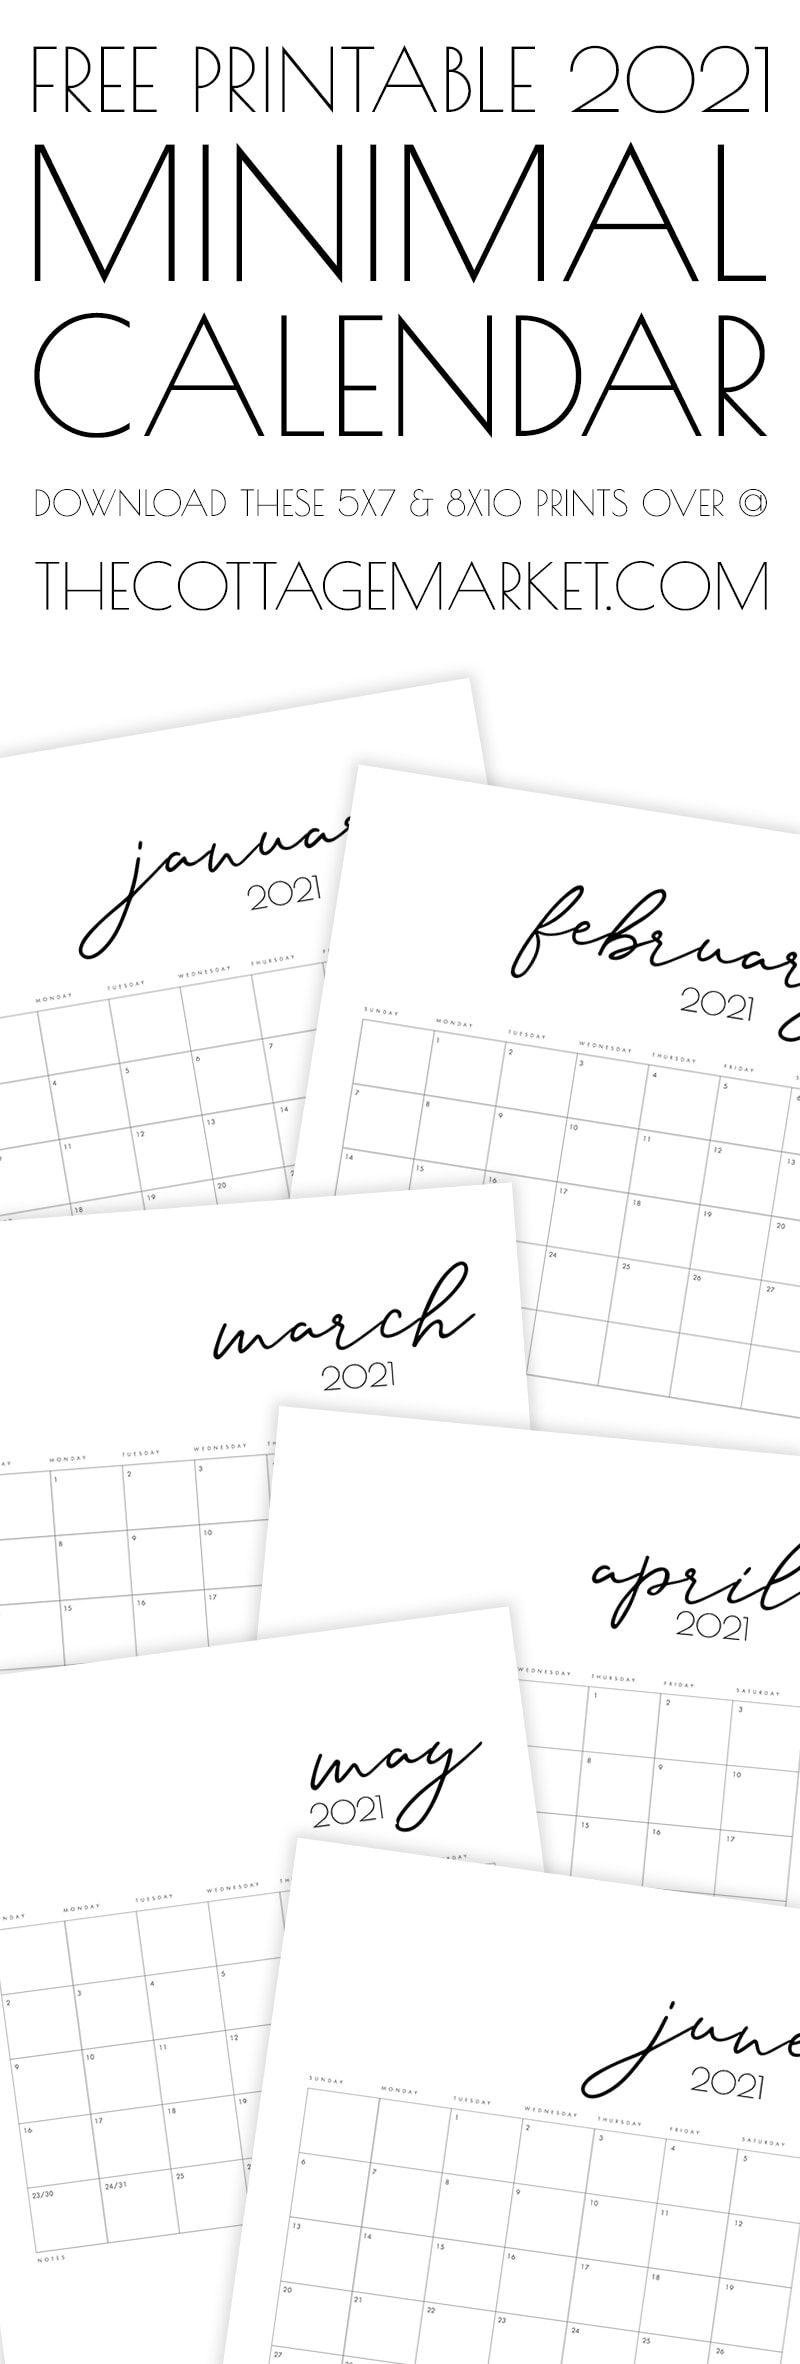 Free Printable 2021 Minimal Calendar - The Cottage Market ...